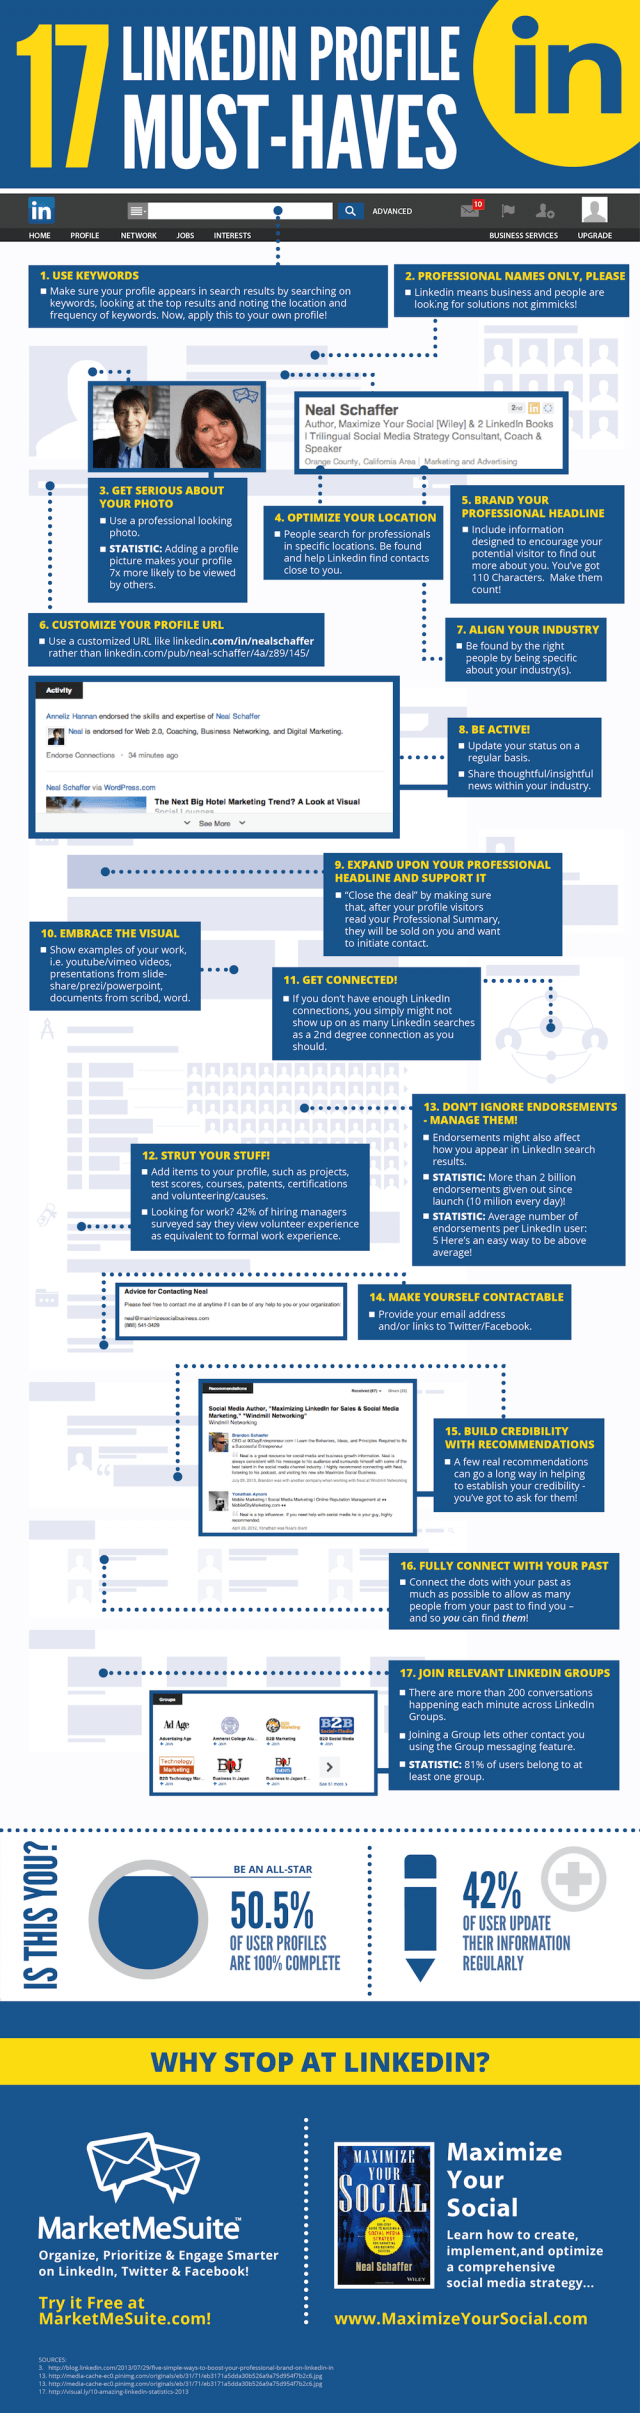 LinkedIn-Perfect-Profile-Tips-Summary-Infographic-Juntae-DeLane